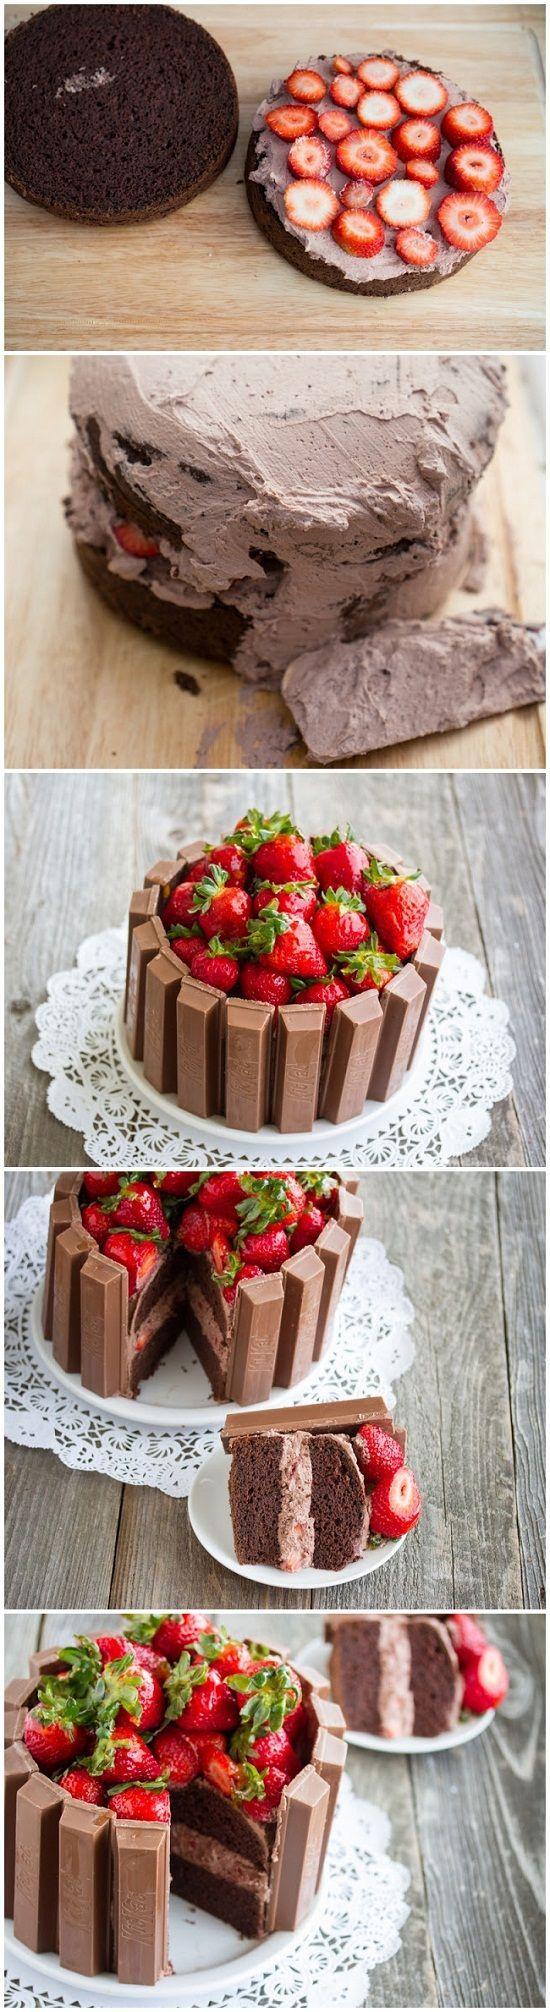 Strawberry Chocolate Kit Kat Cake: